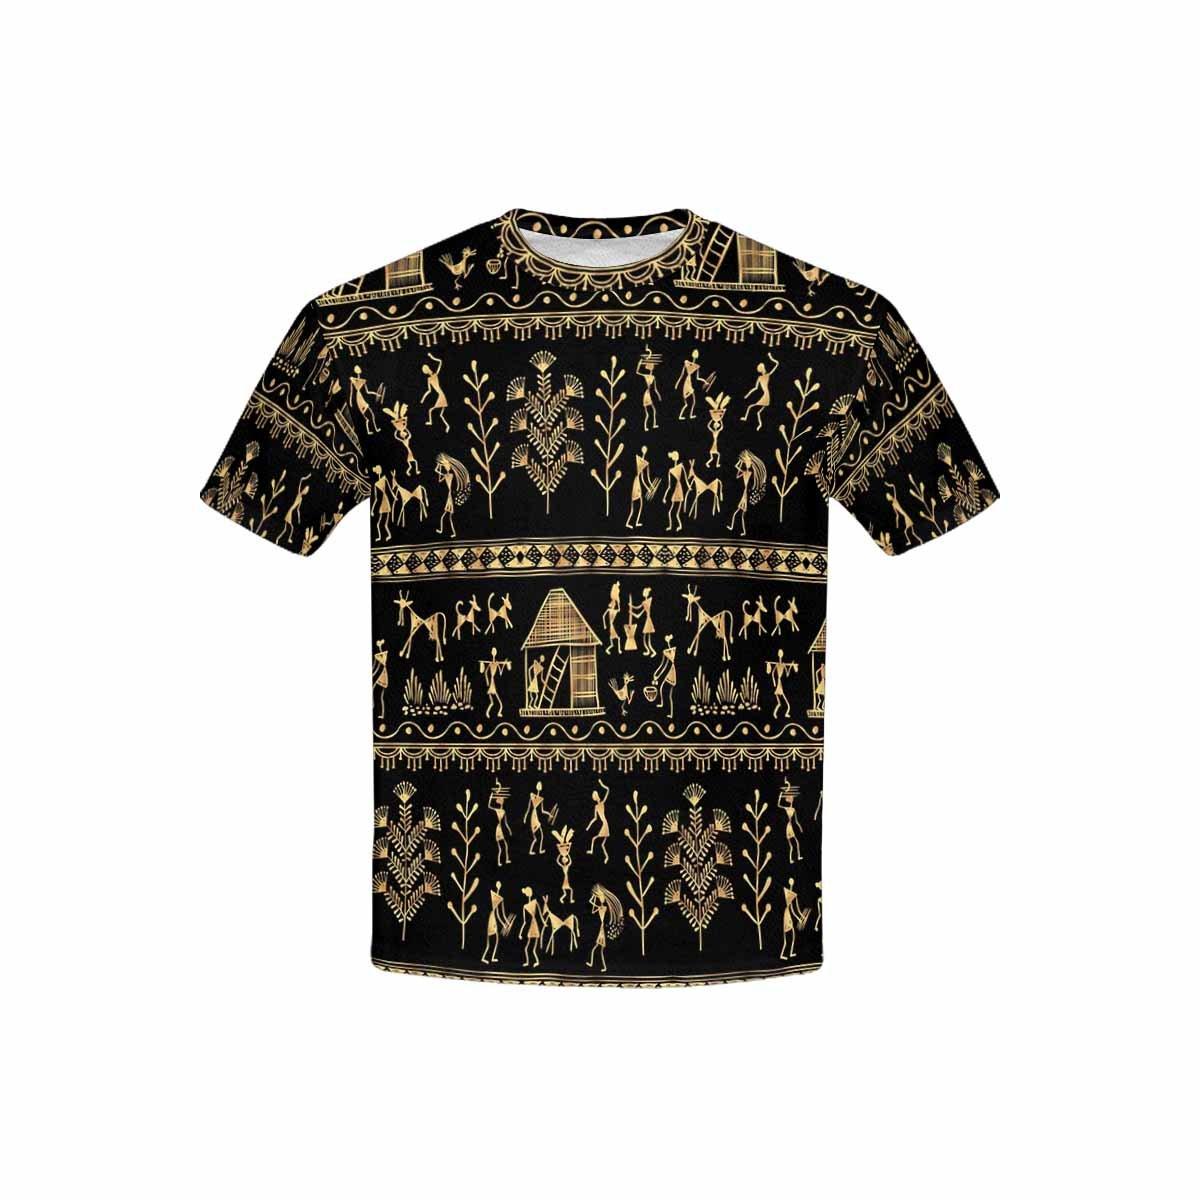 INTERESTPRINT Childs T-Shirt Traditional Art India XS-XL